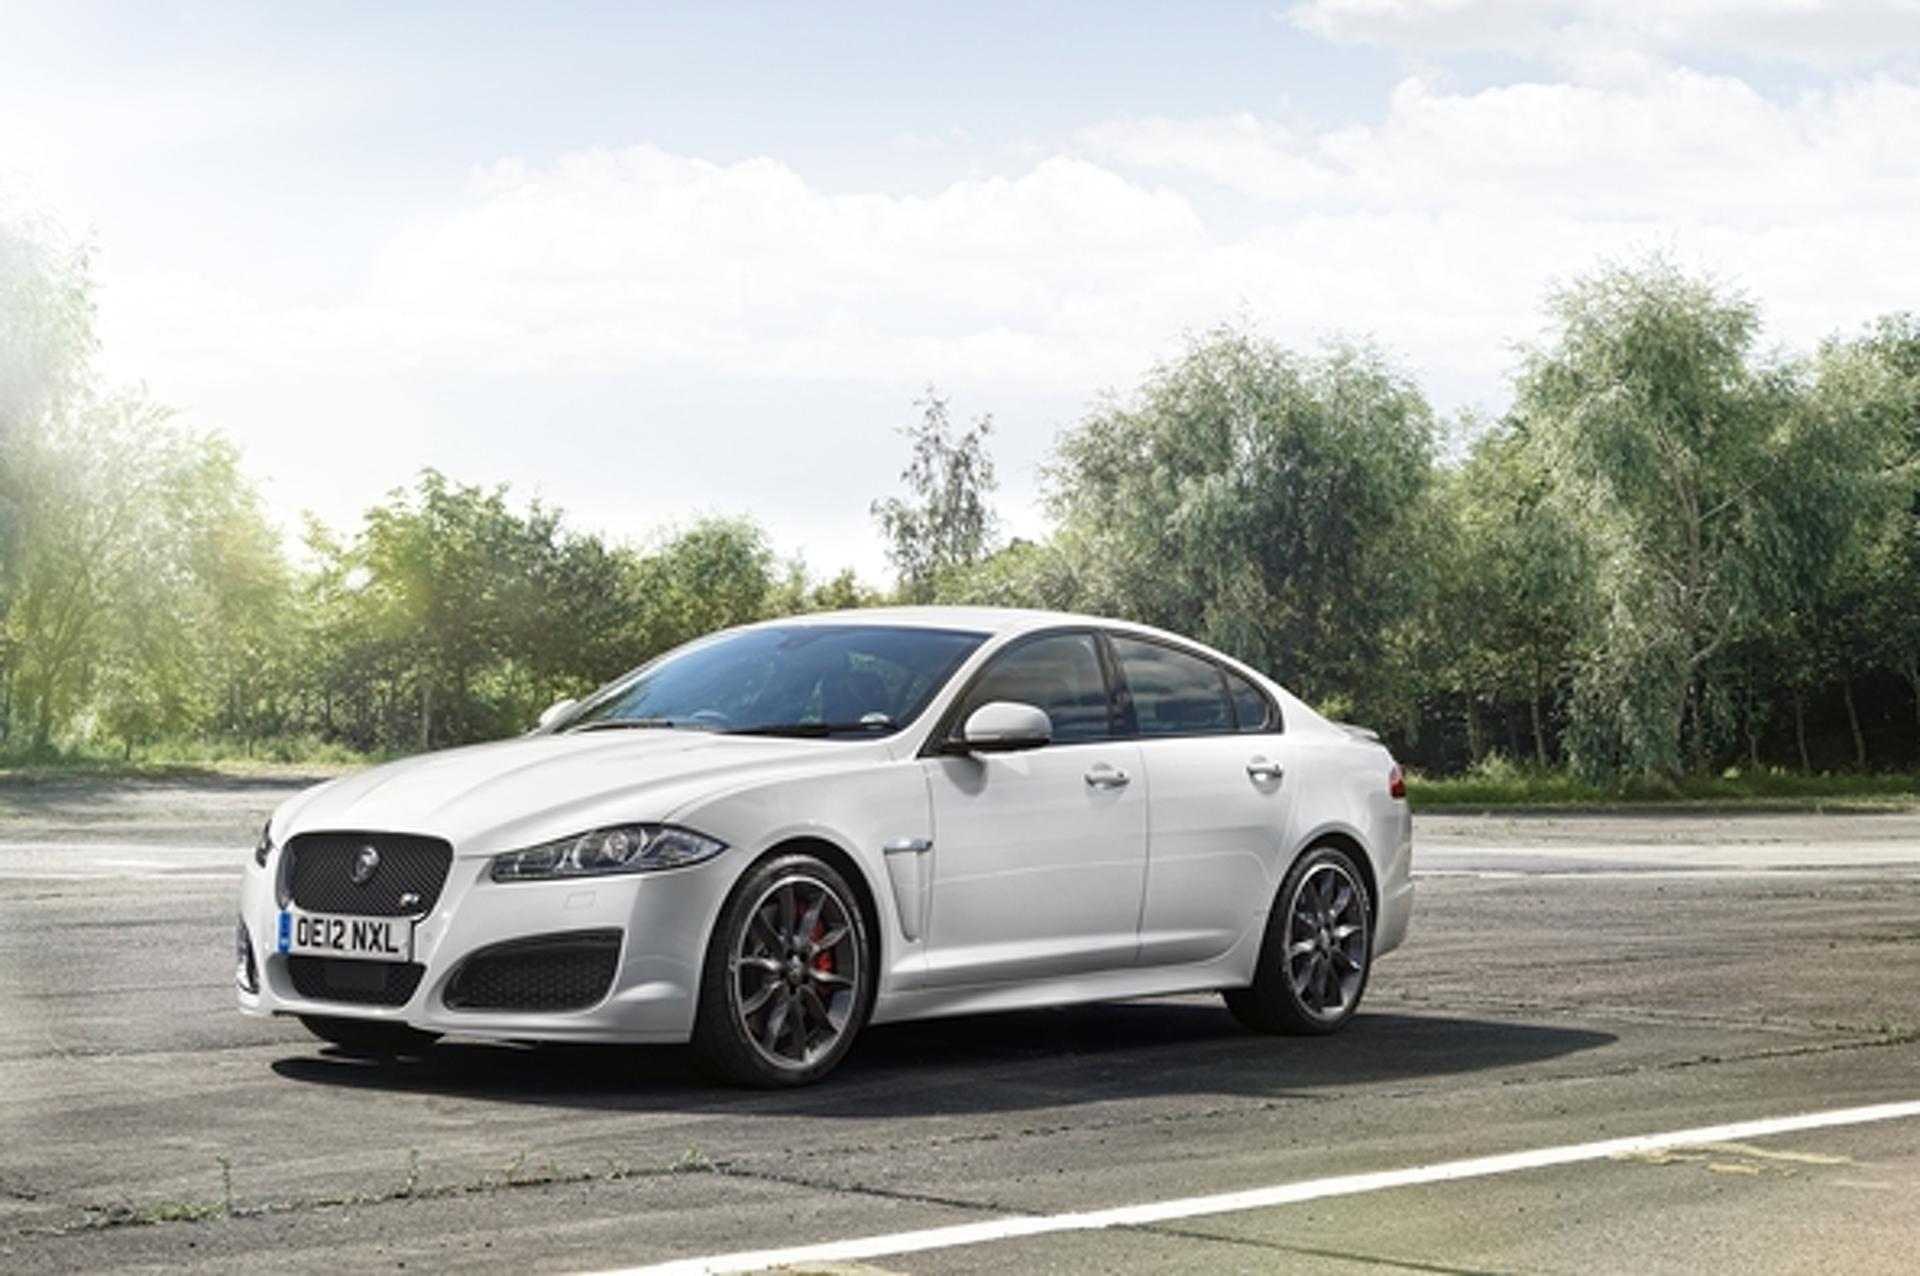 Jaguar XFR Speed Pack Breaks Cover in Moscow